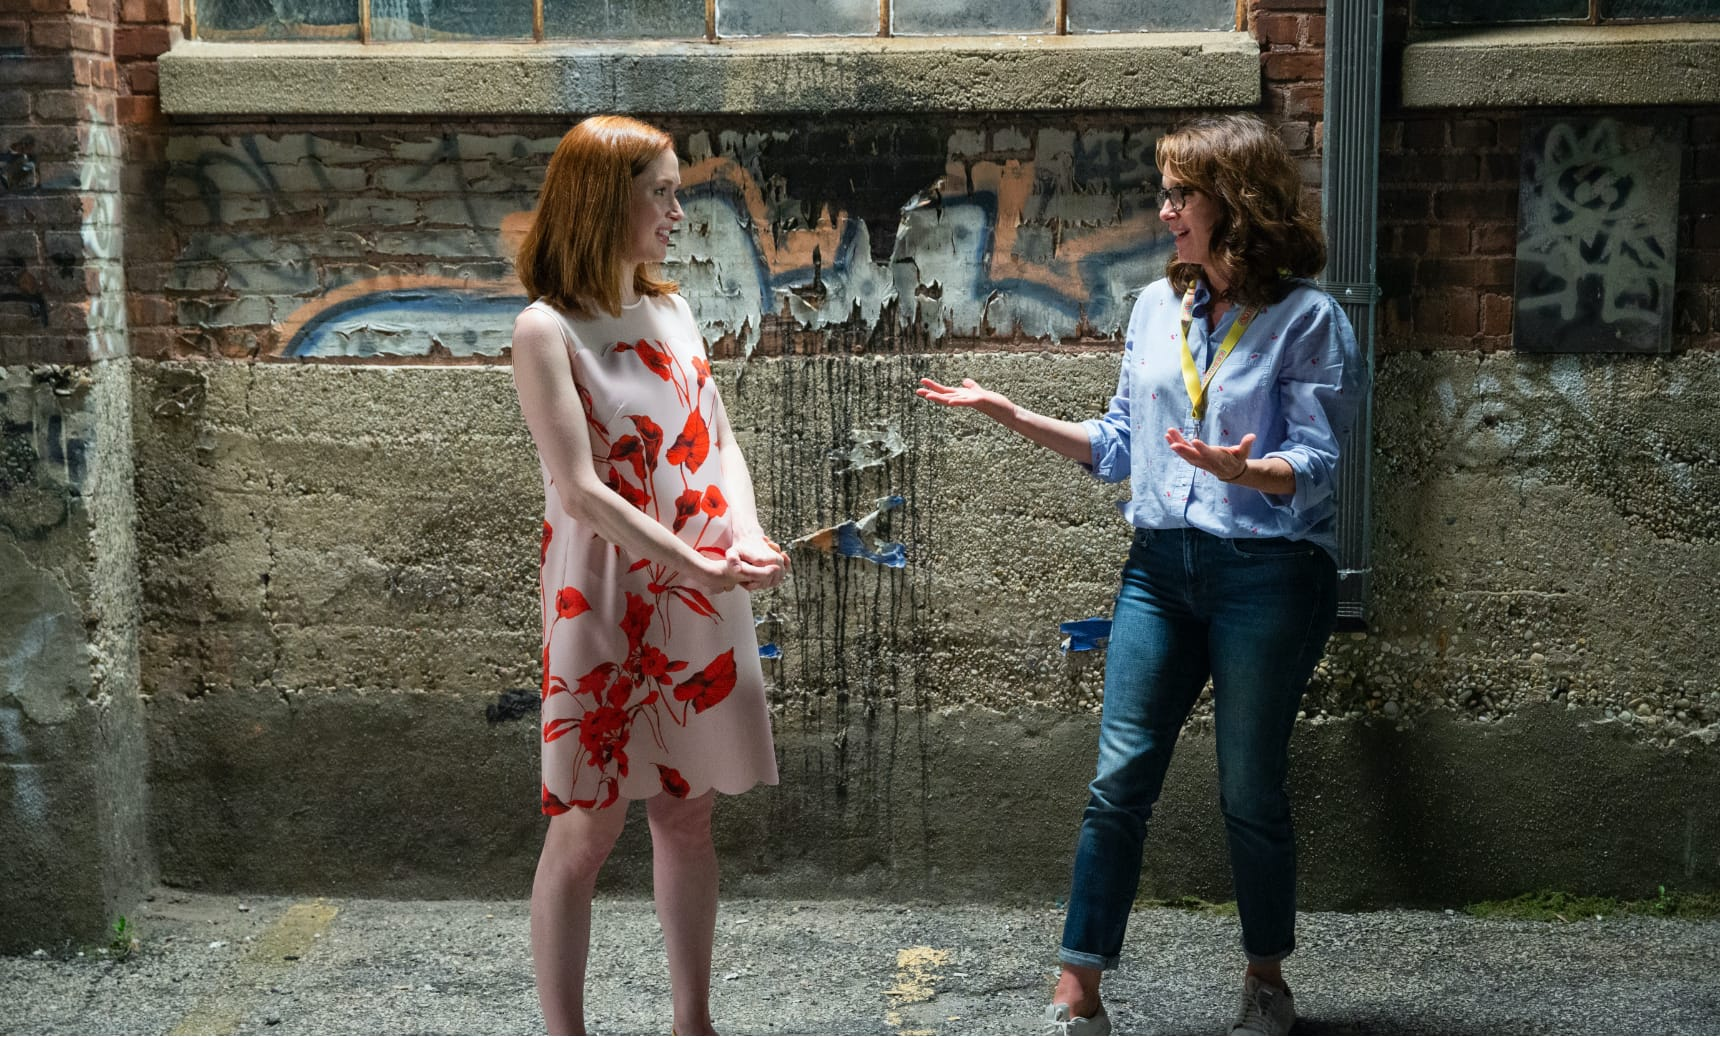 Ellie Kemper and Tina Fey on set